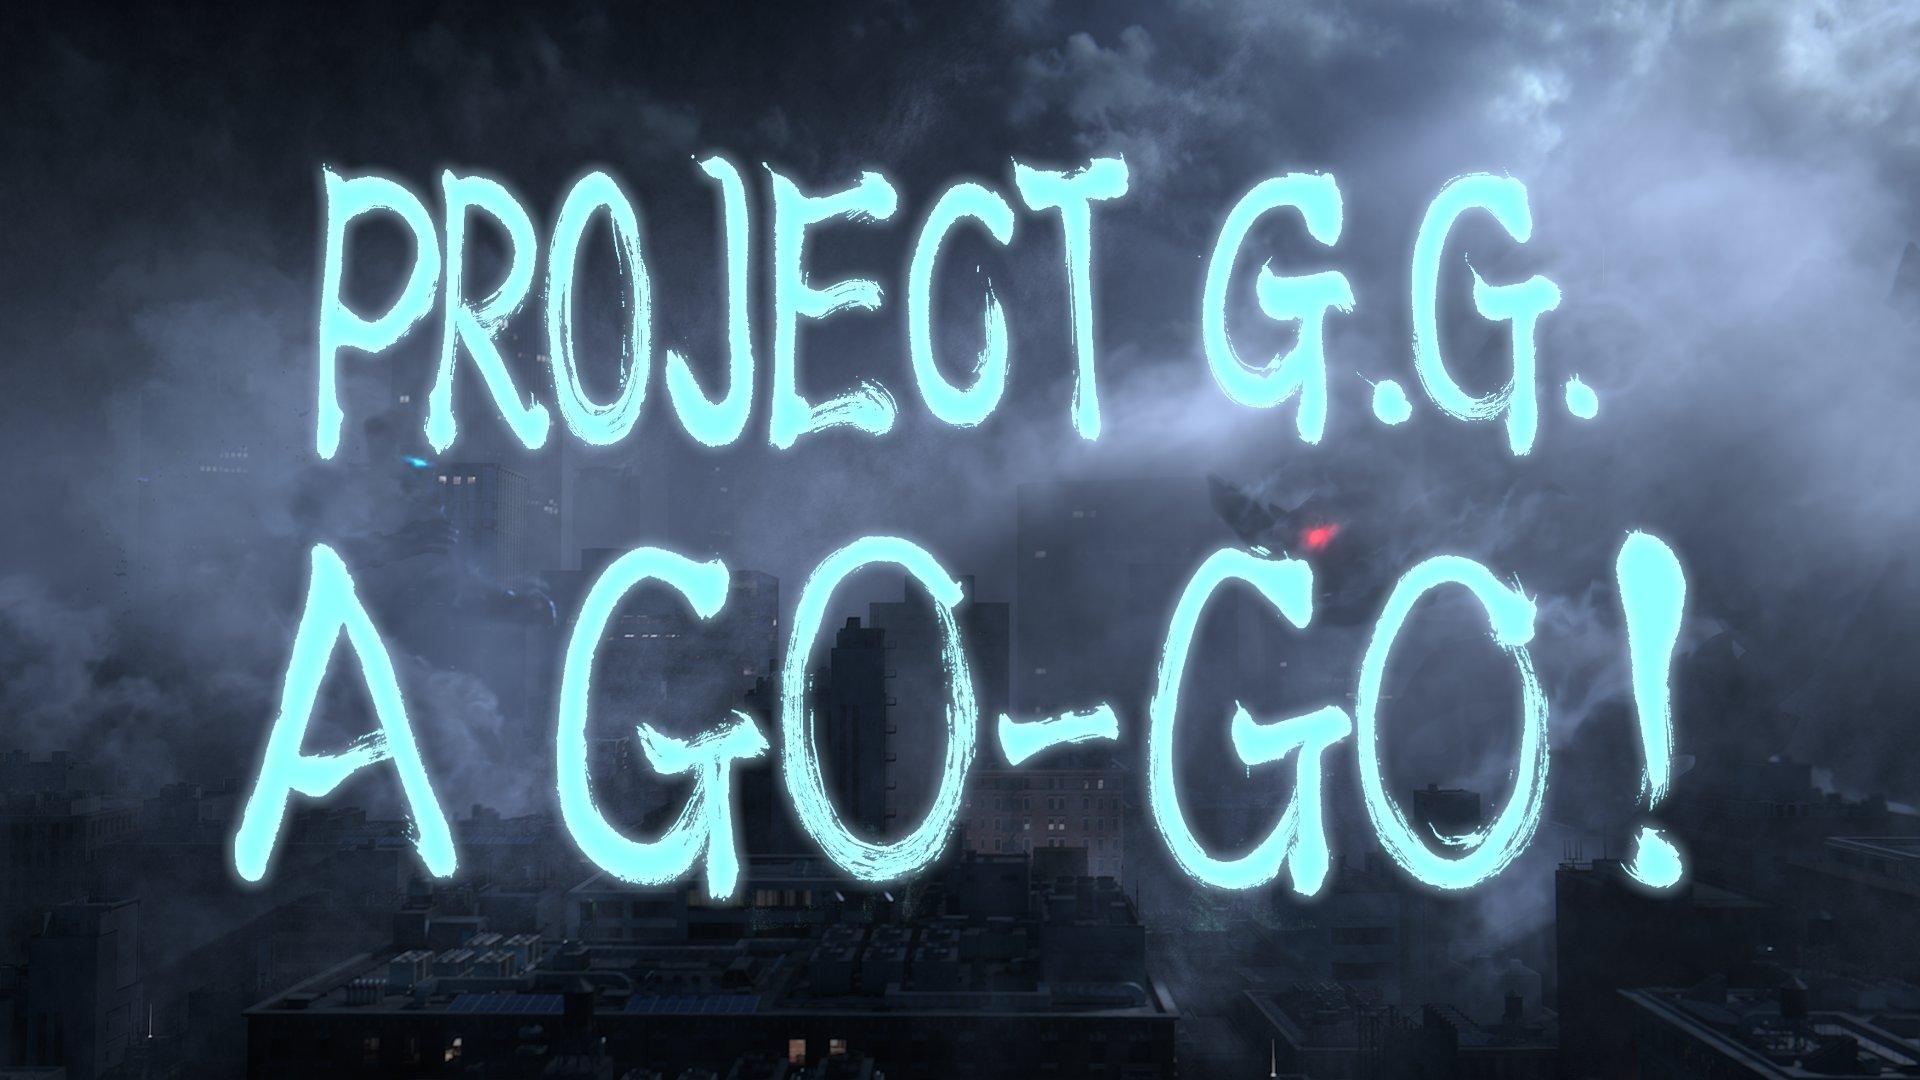 Project GG platinumGames